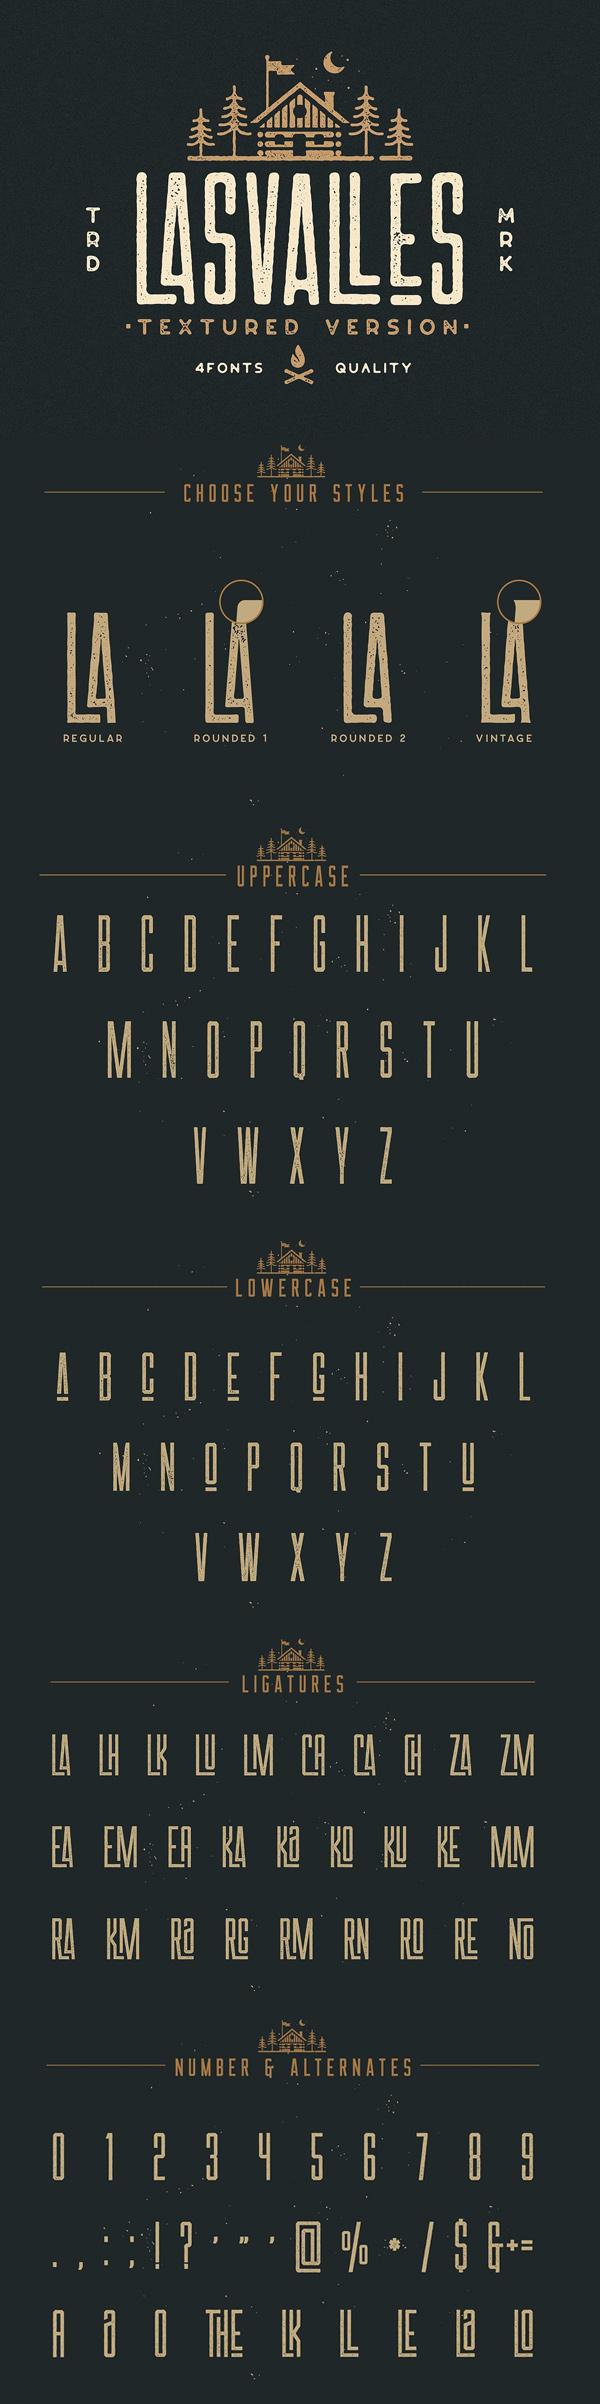 Las Valles Textured Typeface